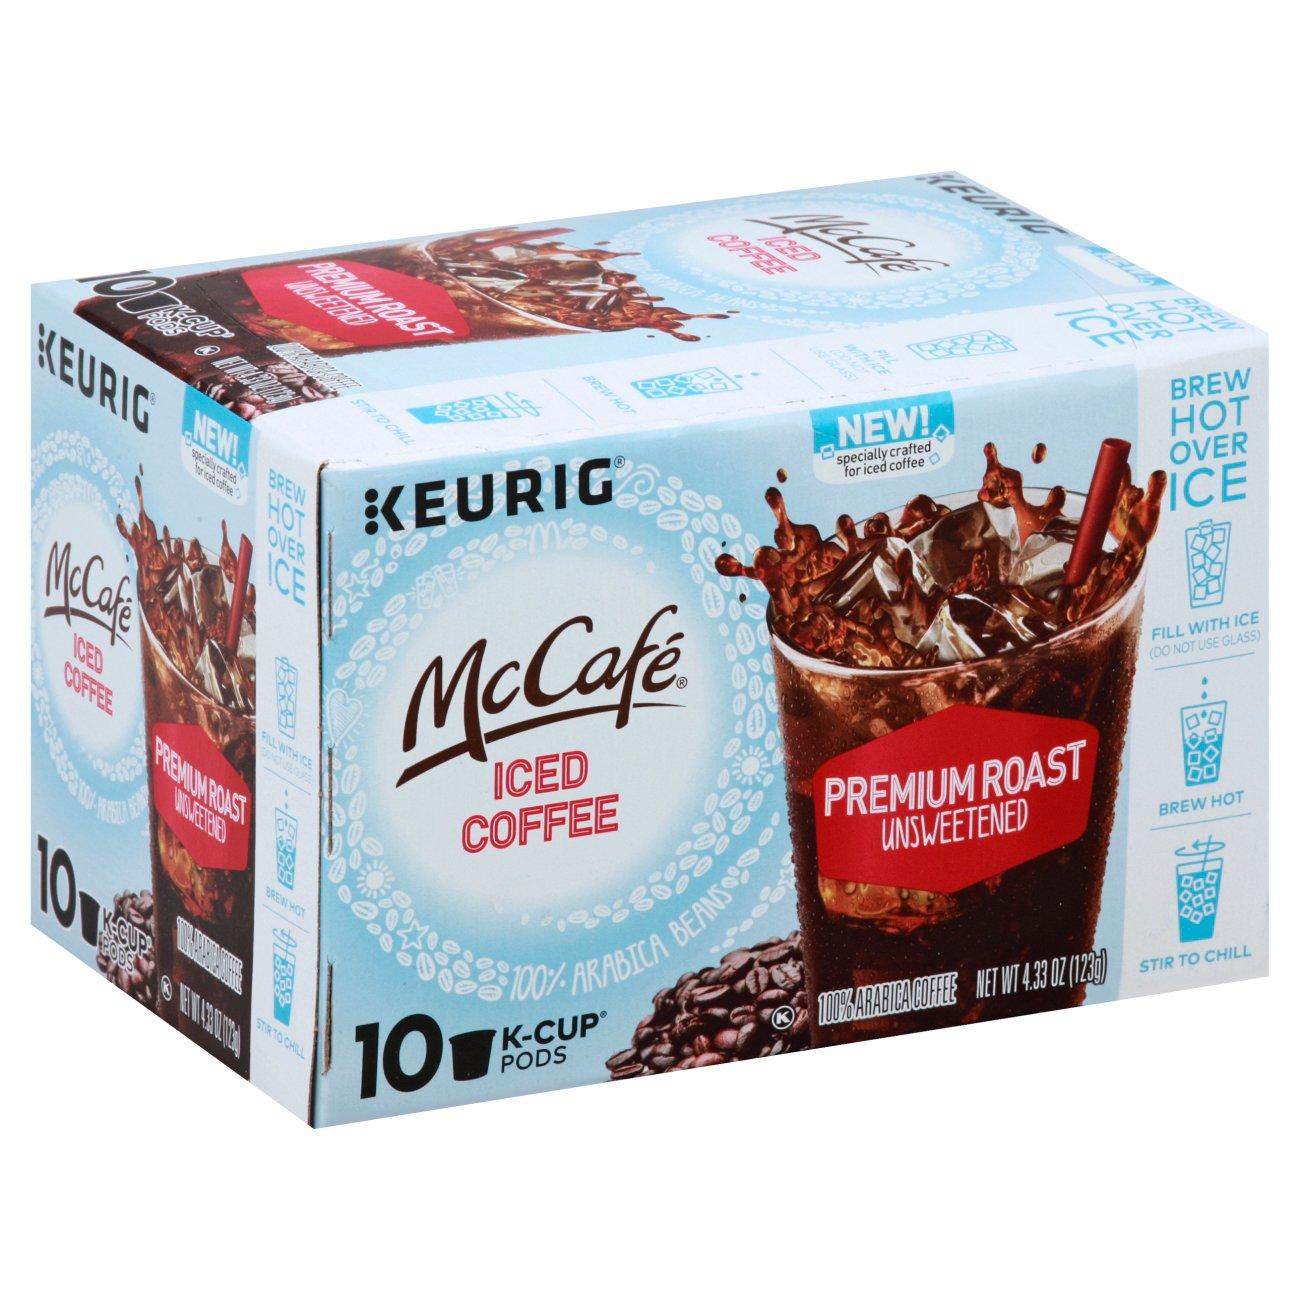 McCafe Keurig Ice Coffee Premium Roast Unsweetened Single Serve Coffee K Cups ‑ Shop Coffee at H‑E‑B